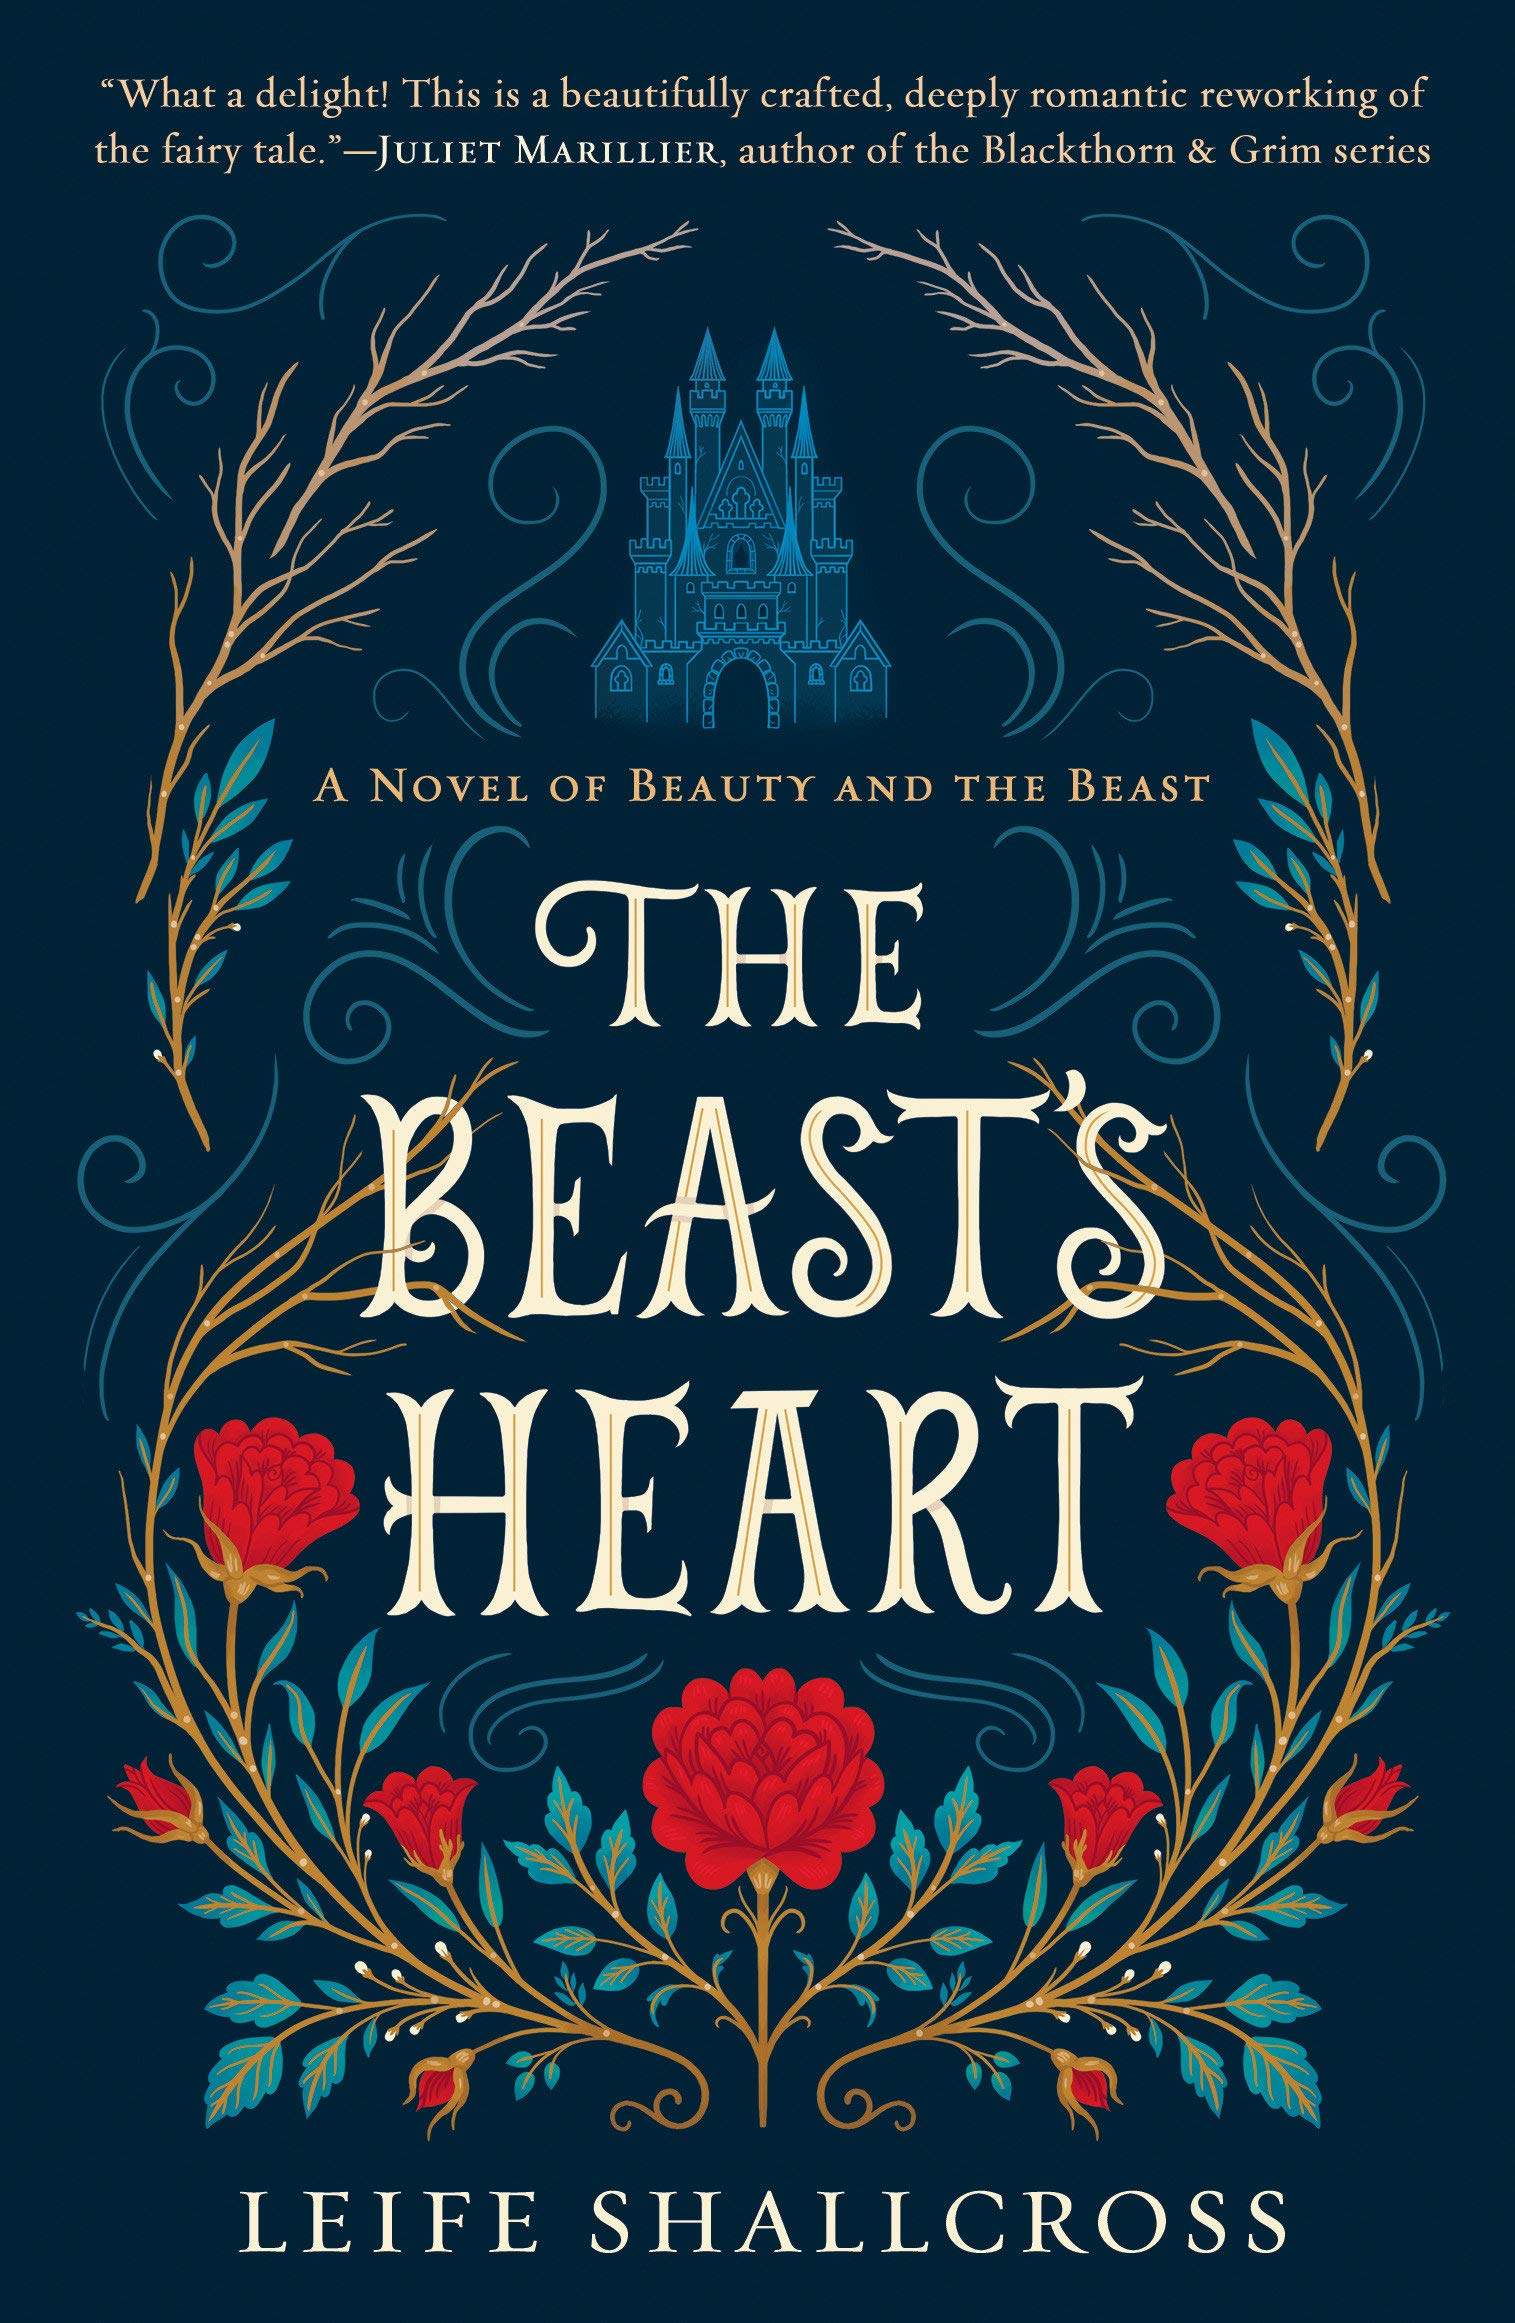 Amazon the beasts heart a novel of beauty and the beast amazon the beasts heart a novel of beauty and the beast 9780440001775 leife shallcross books izmirmasajfo